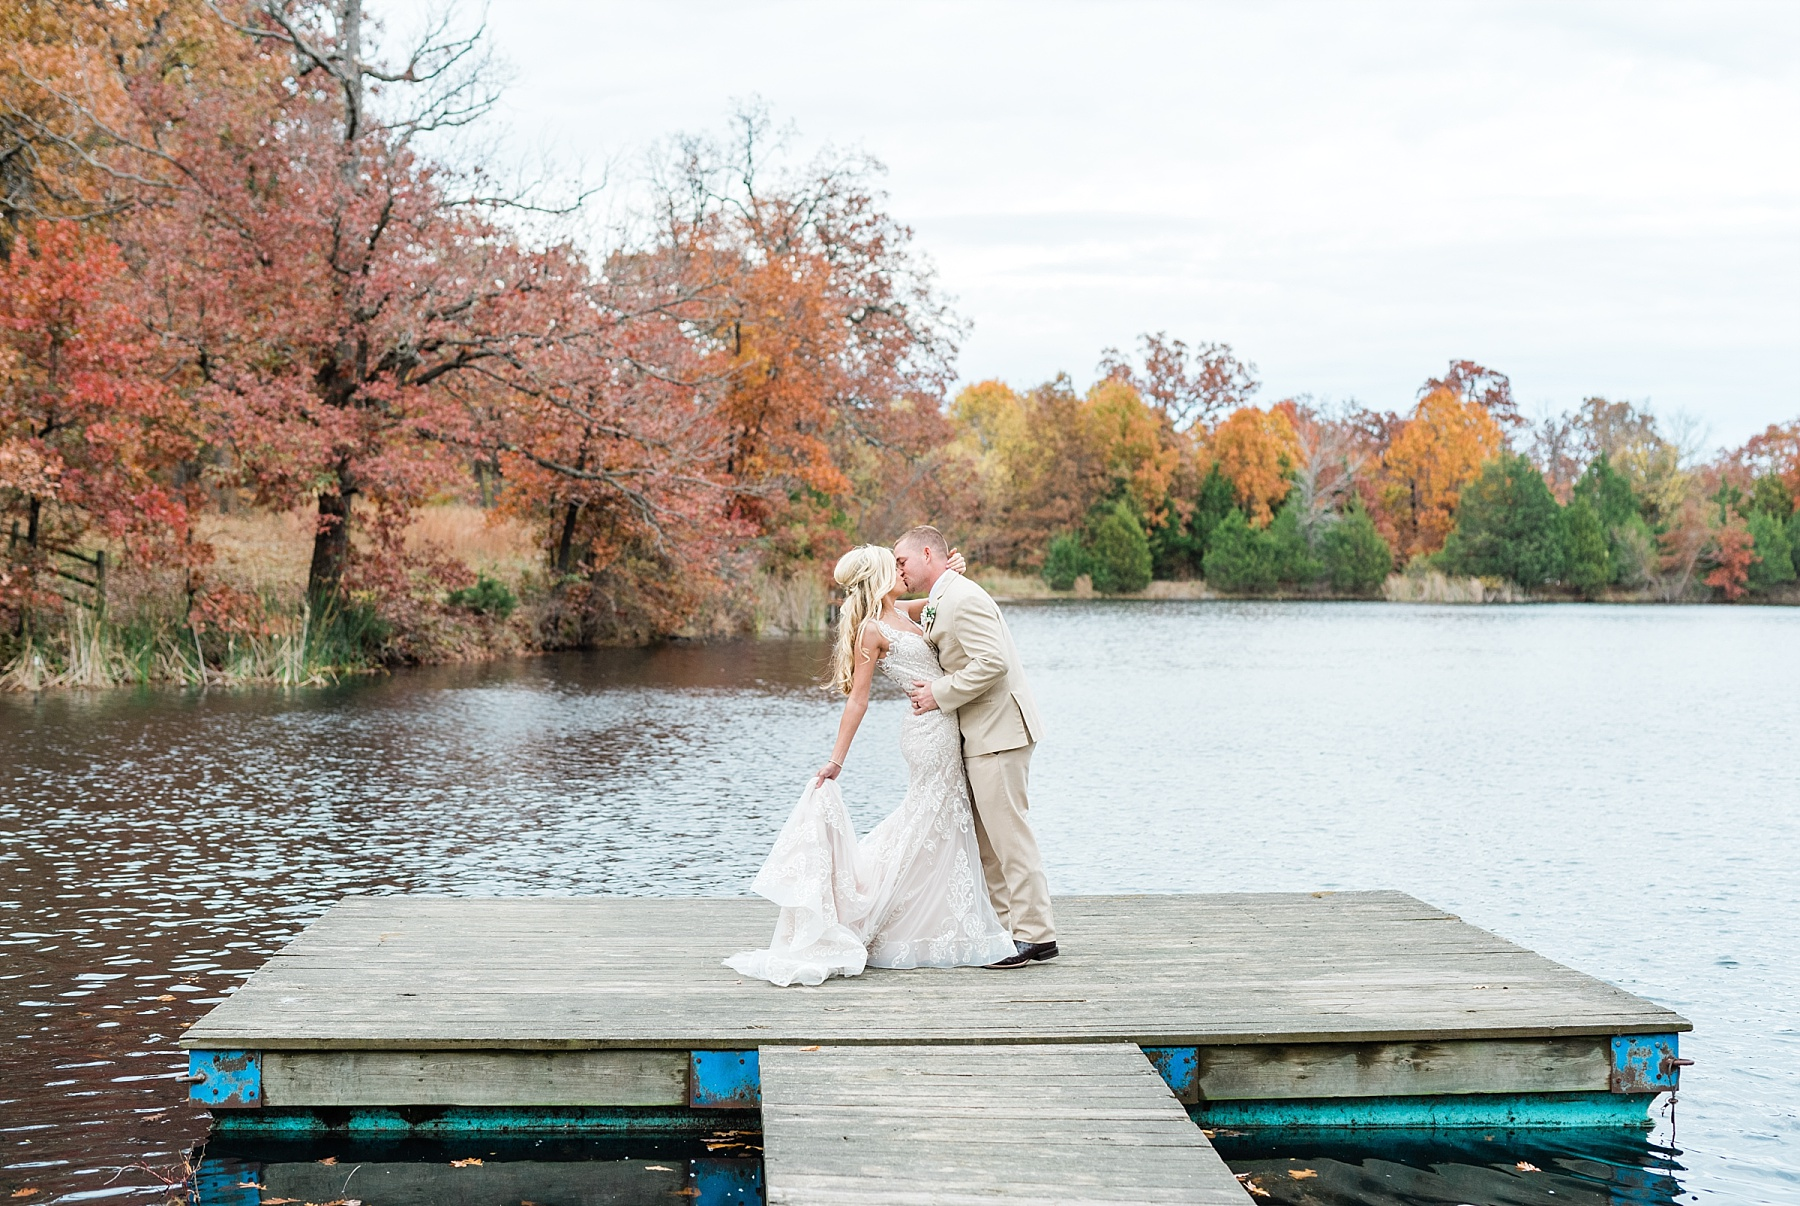 Lakeside Wedding in Fall at Mighty Oak Lodge by Misouri Wedding Photographer Kelsi Kliethermes Photography_0005.jpg